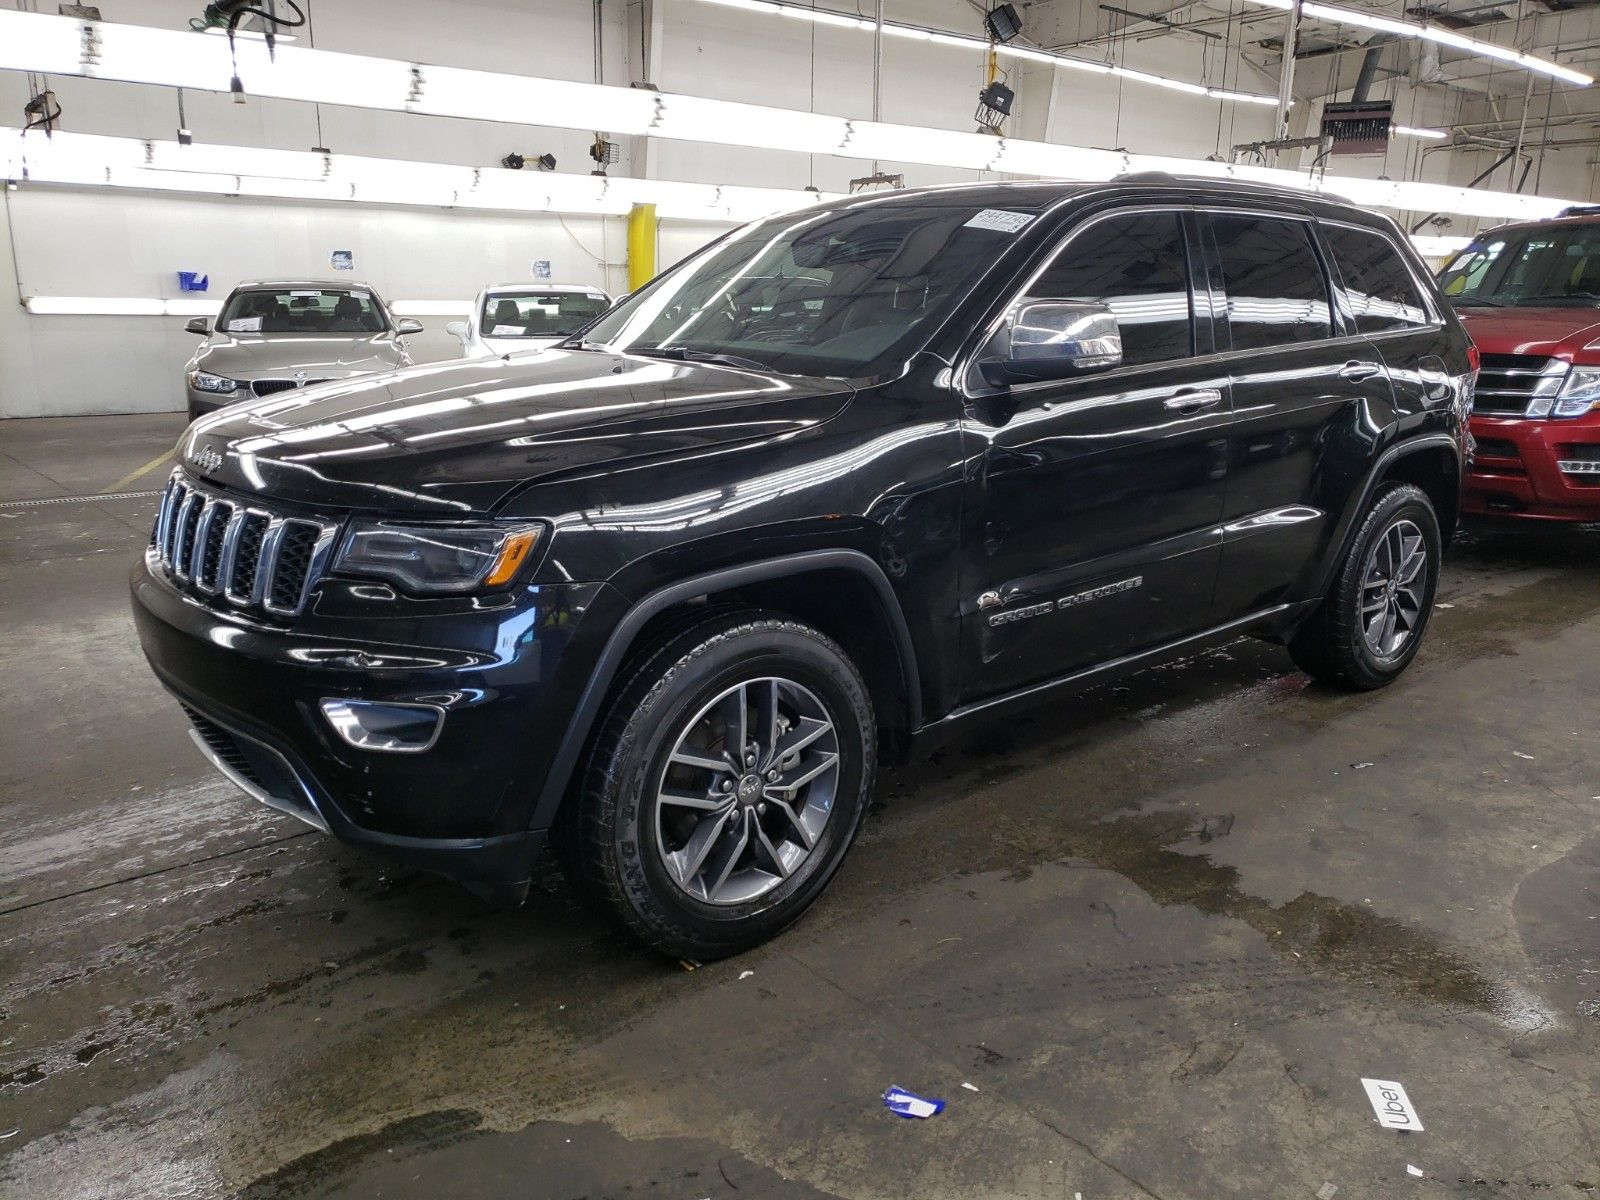 2017 Jeep Grand cherokee 3.6. Lot 99912904681 Vin 1C4RJEBG1HC779298